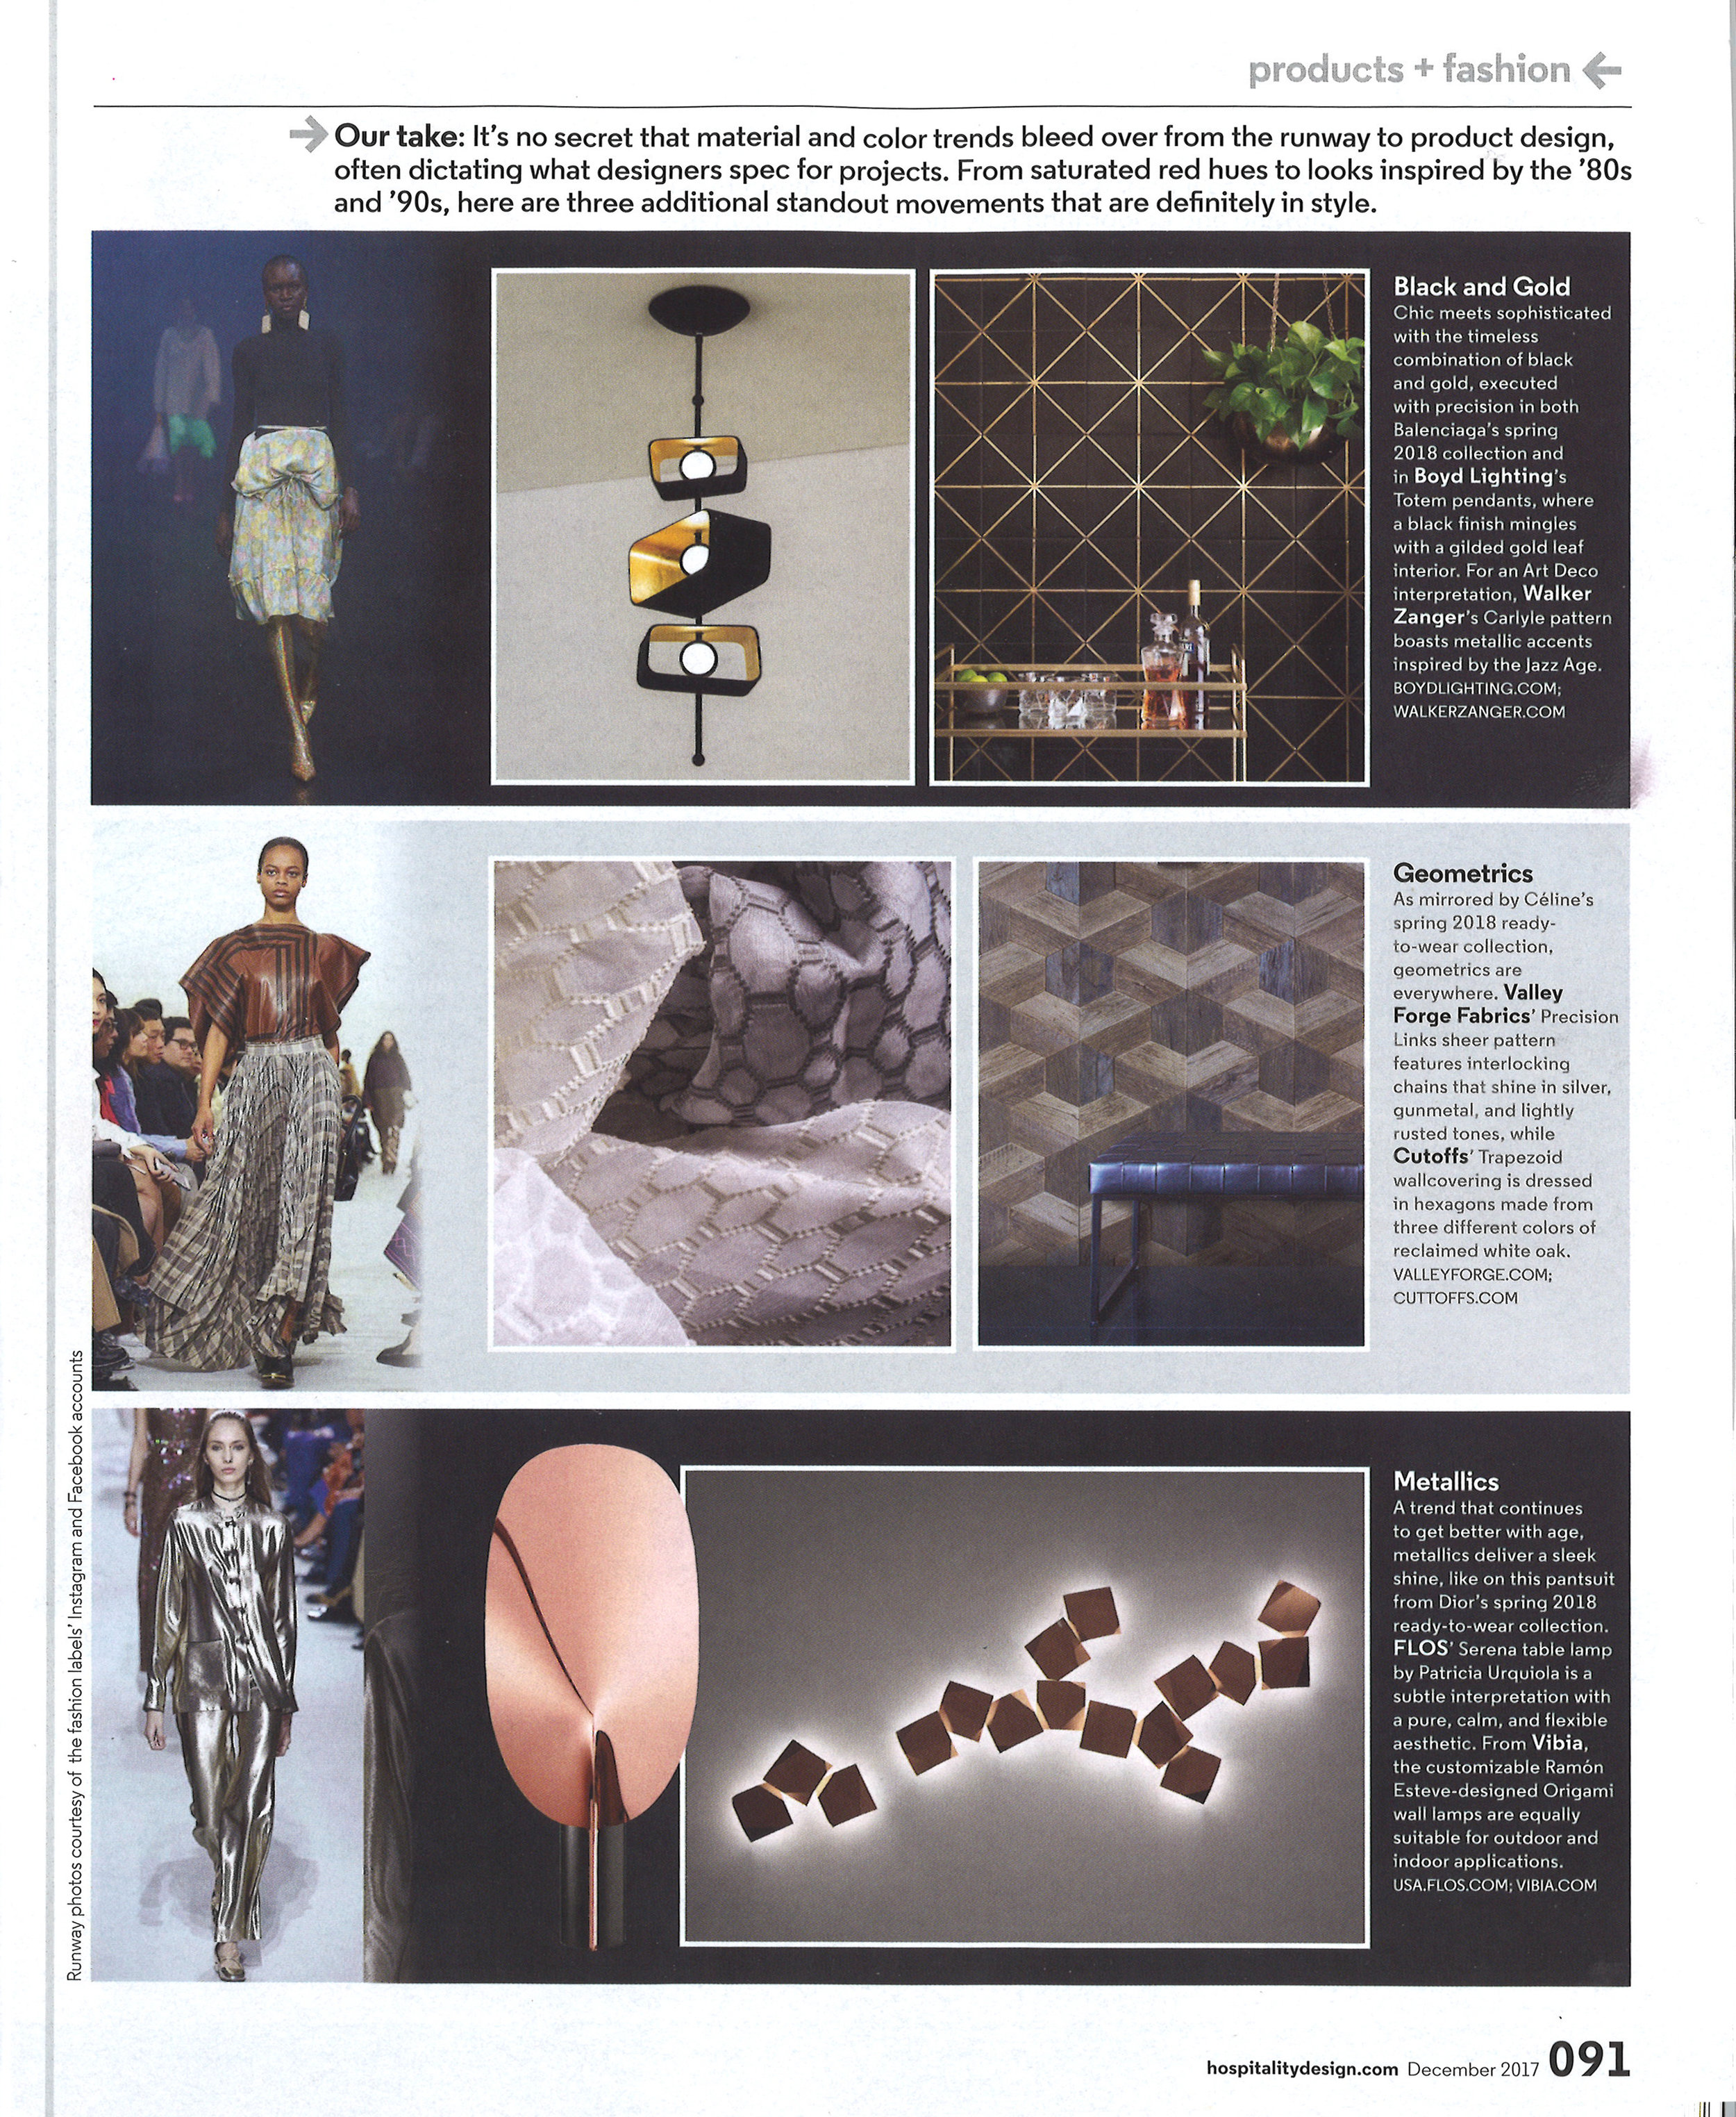 Totem 3 Pendant by Boyd Lighting in Hospitality Design magazine December 2017